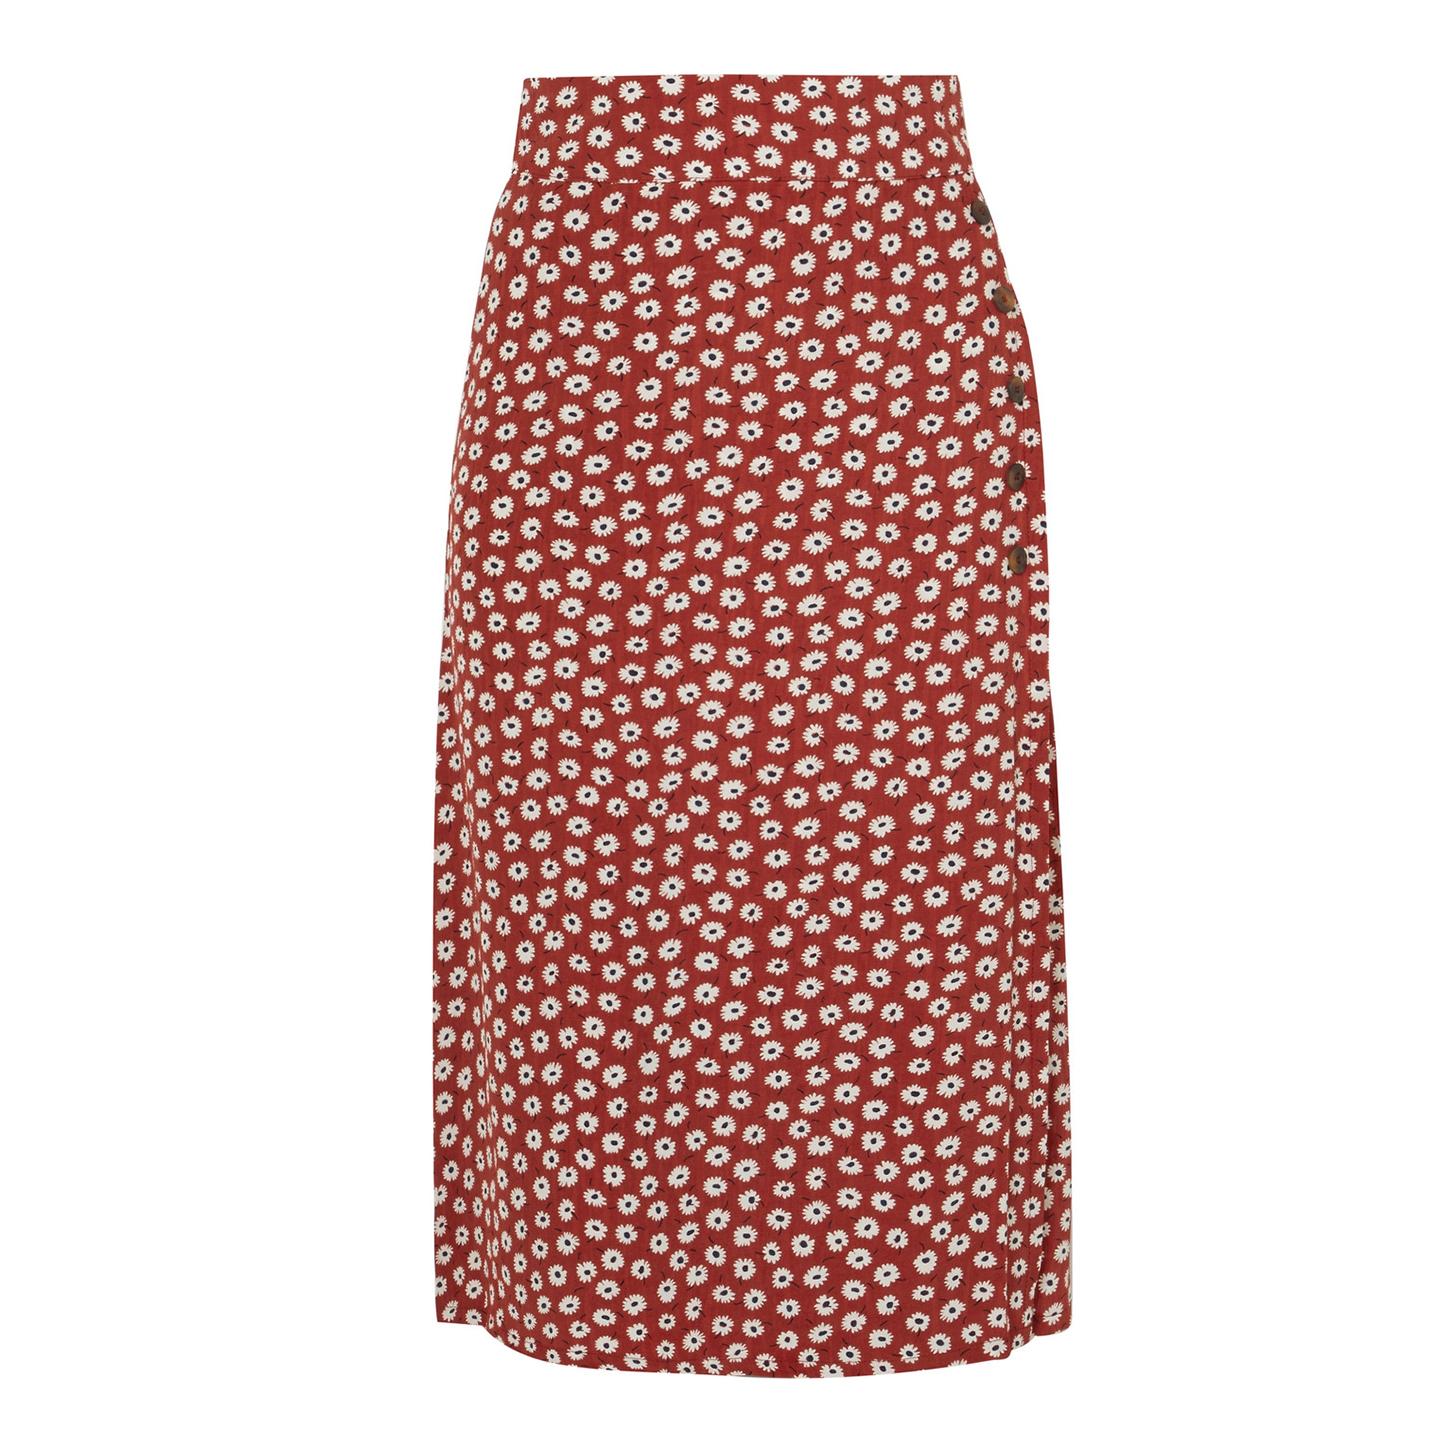 Faithfull The Brand Joy Floral Skirt